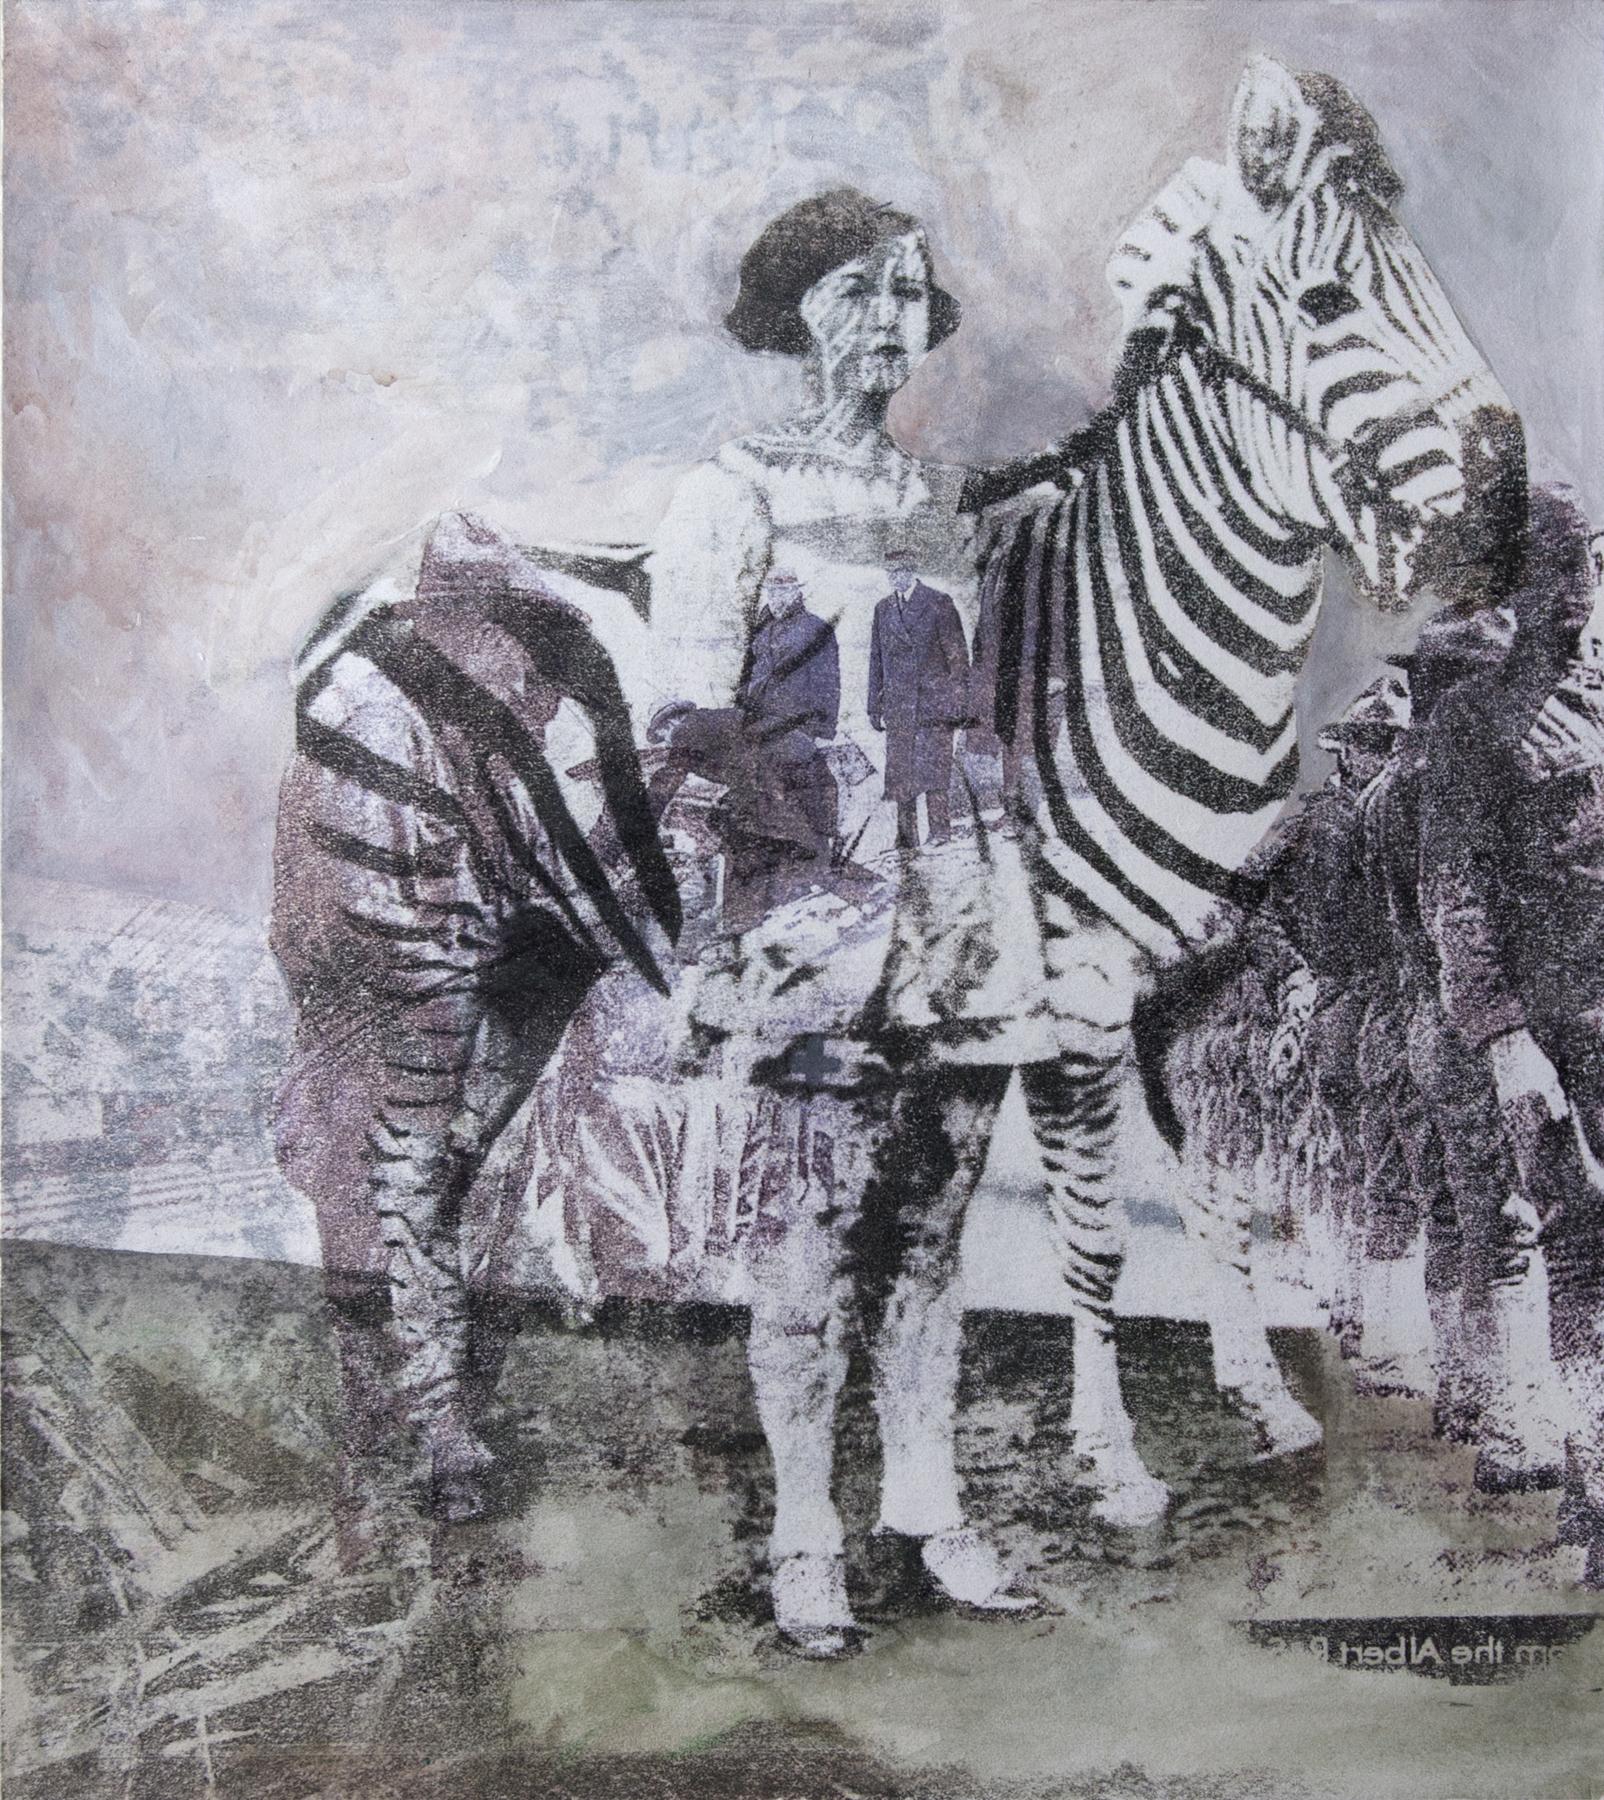 The Zebra Woman